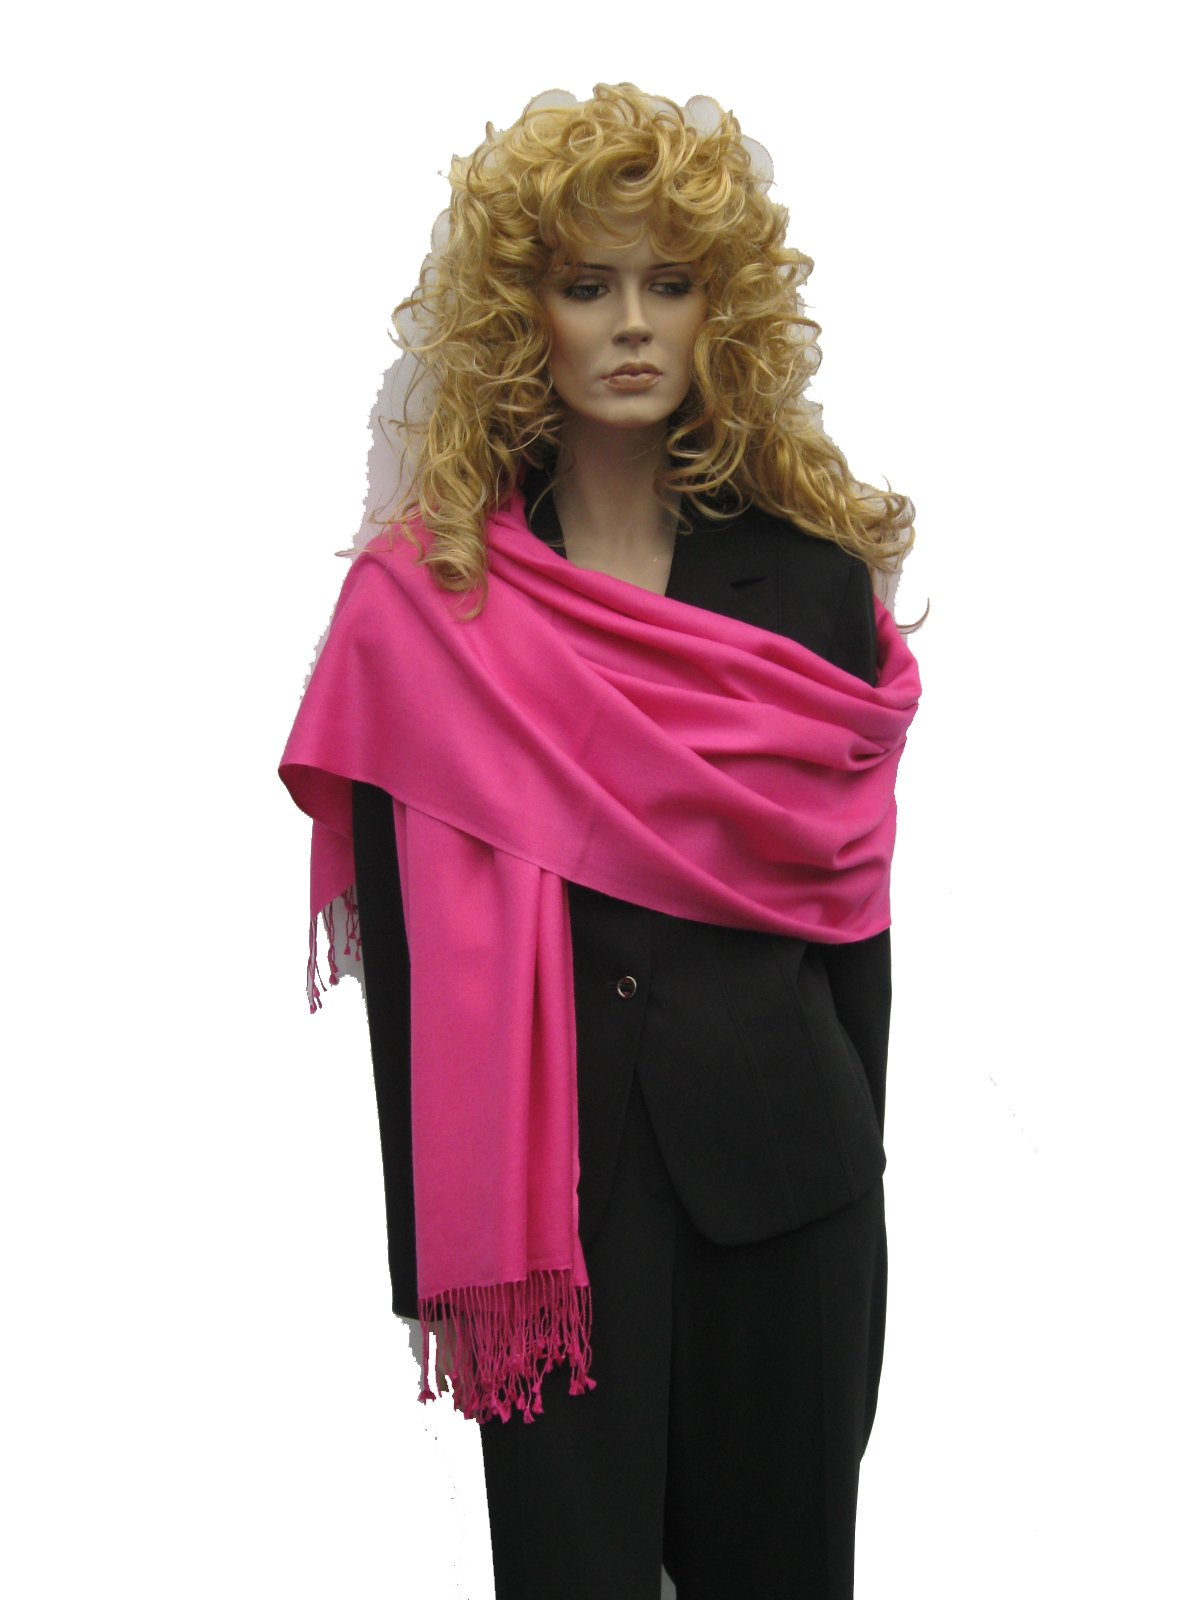 Cashmere Pashmina Group: Solid Pashmina Shawl, Scarf, Wrap & Stole(Regular size) Hot Pink